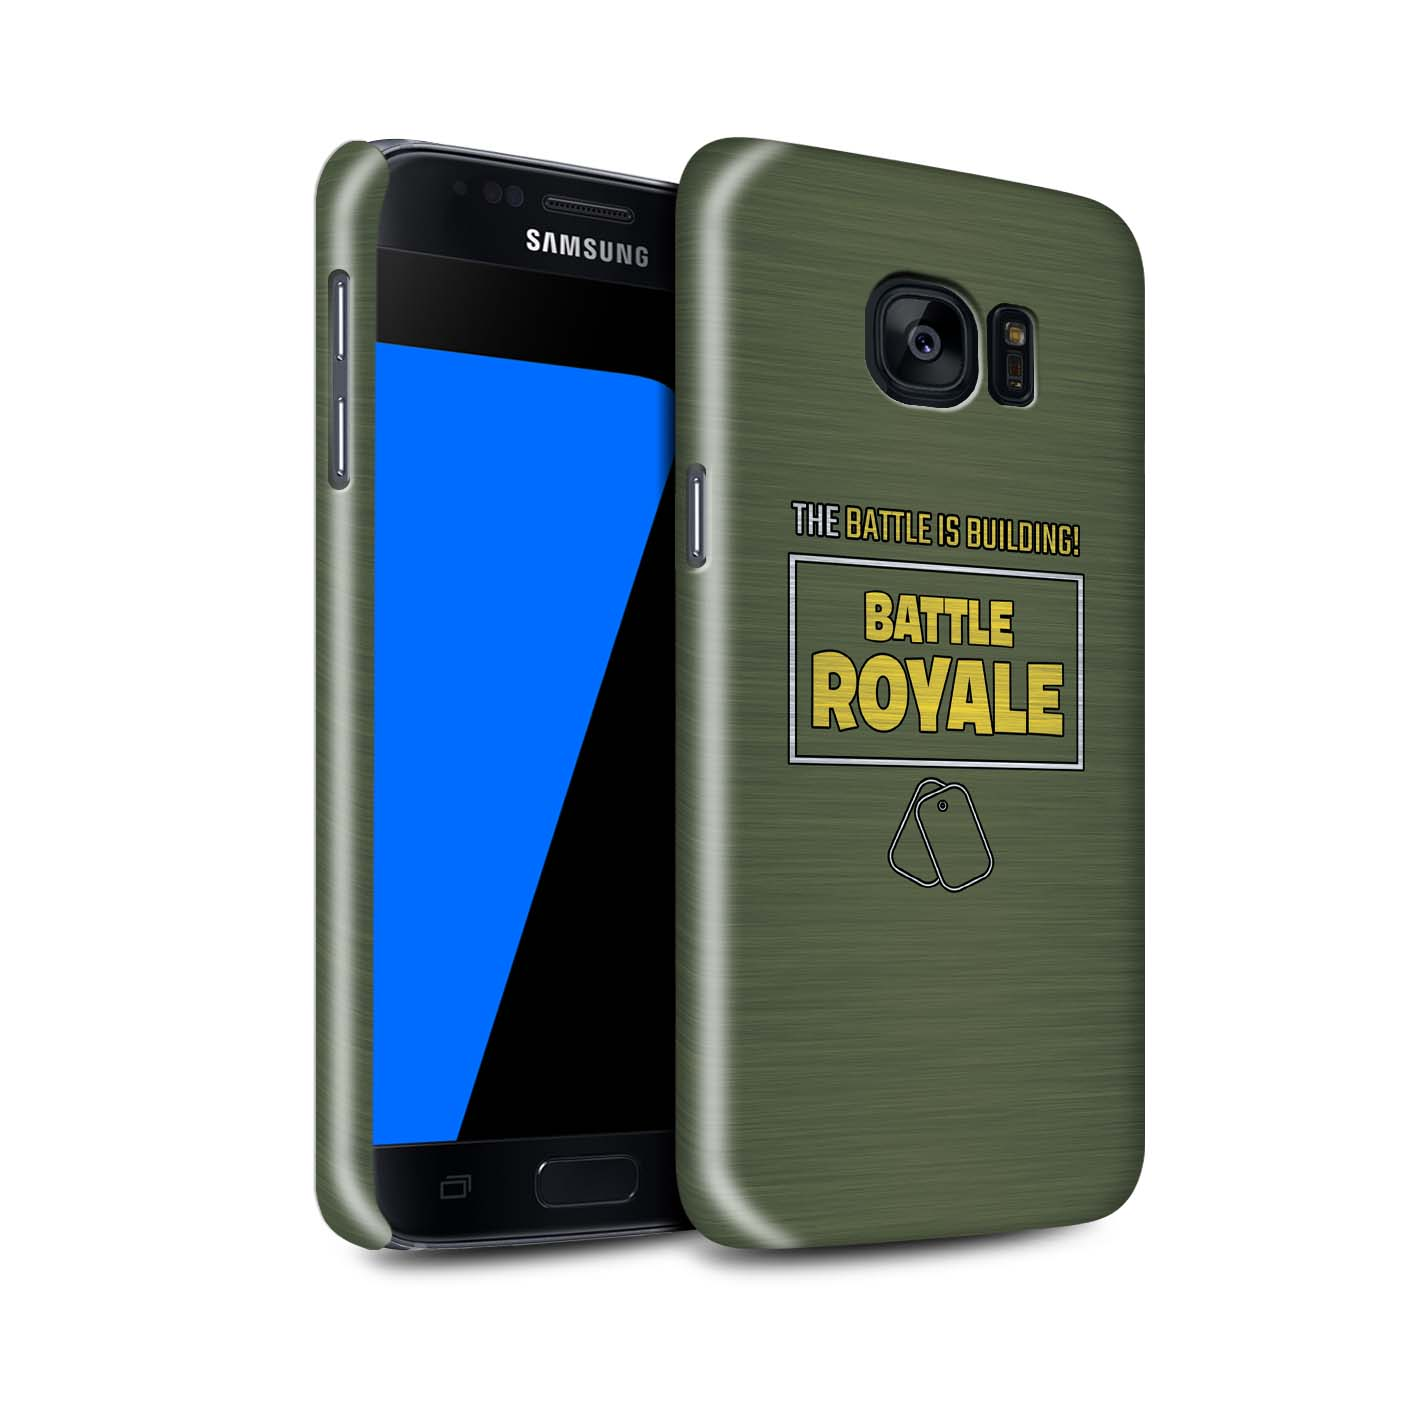 STUFF4-Gloss-Phone-Case-for-Samsung-Galaxy-S7-G930-FN-Battle-Royale